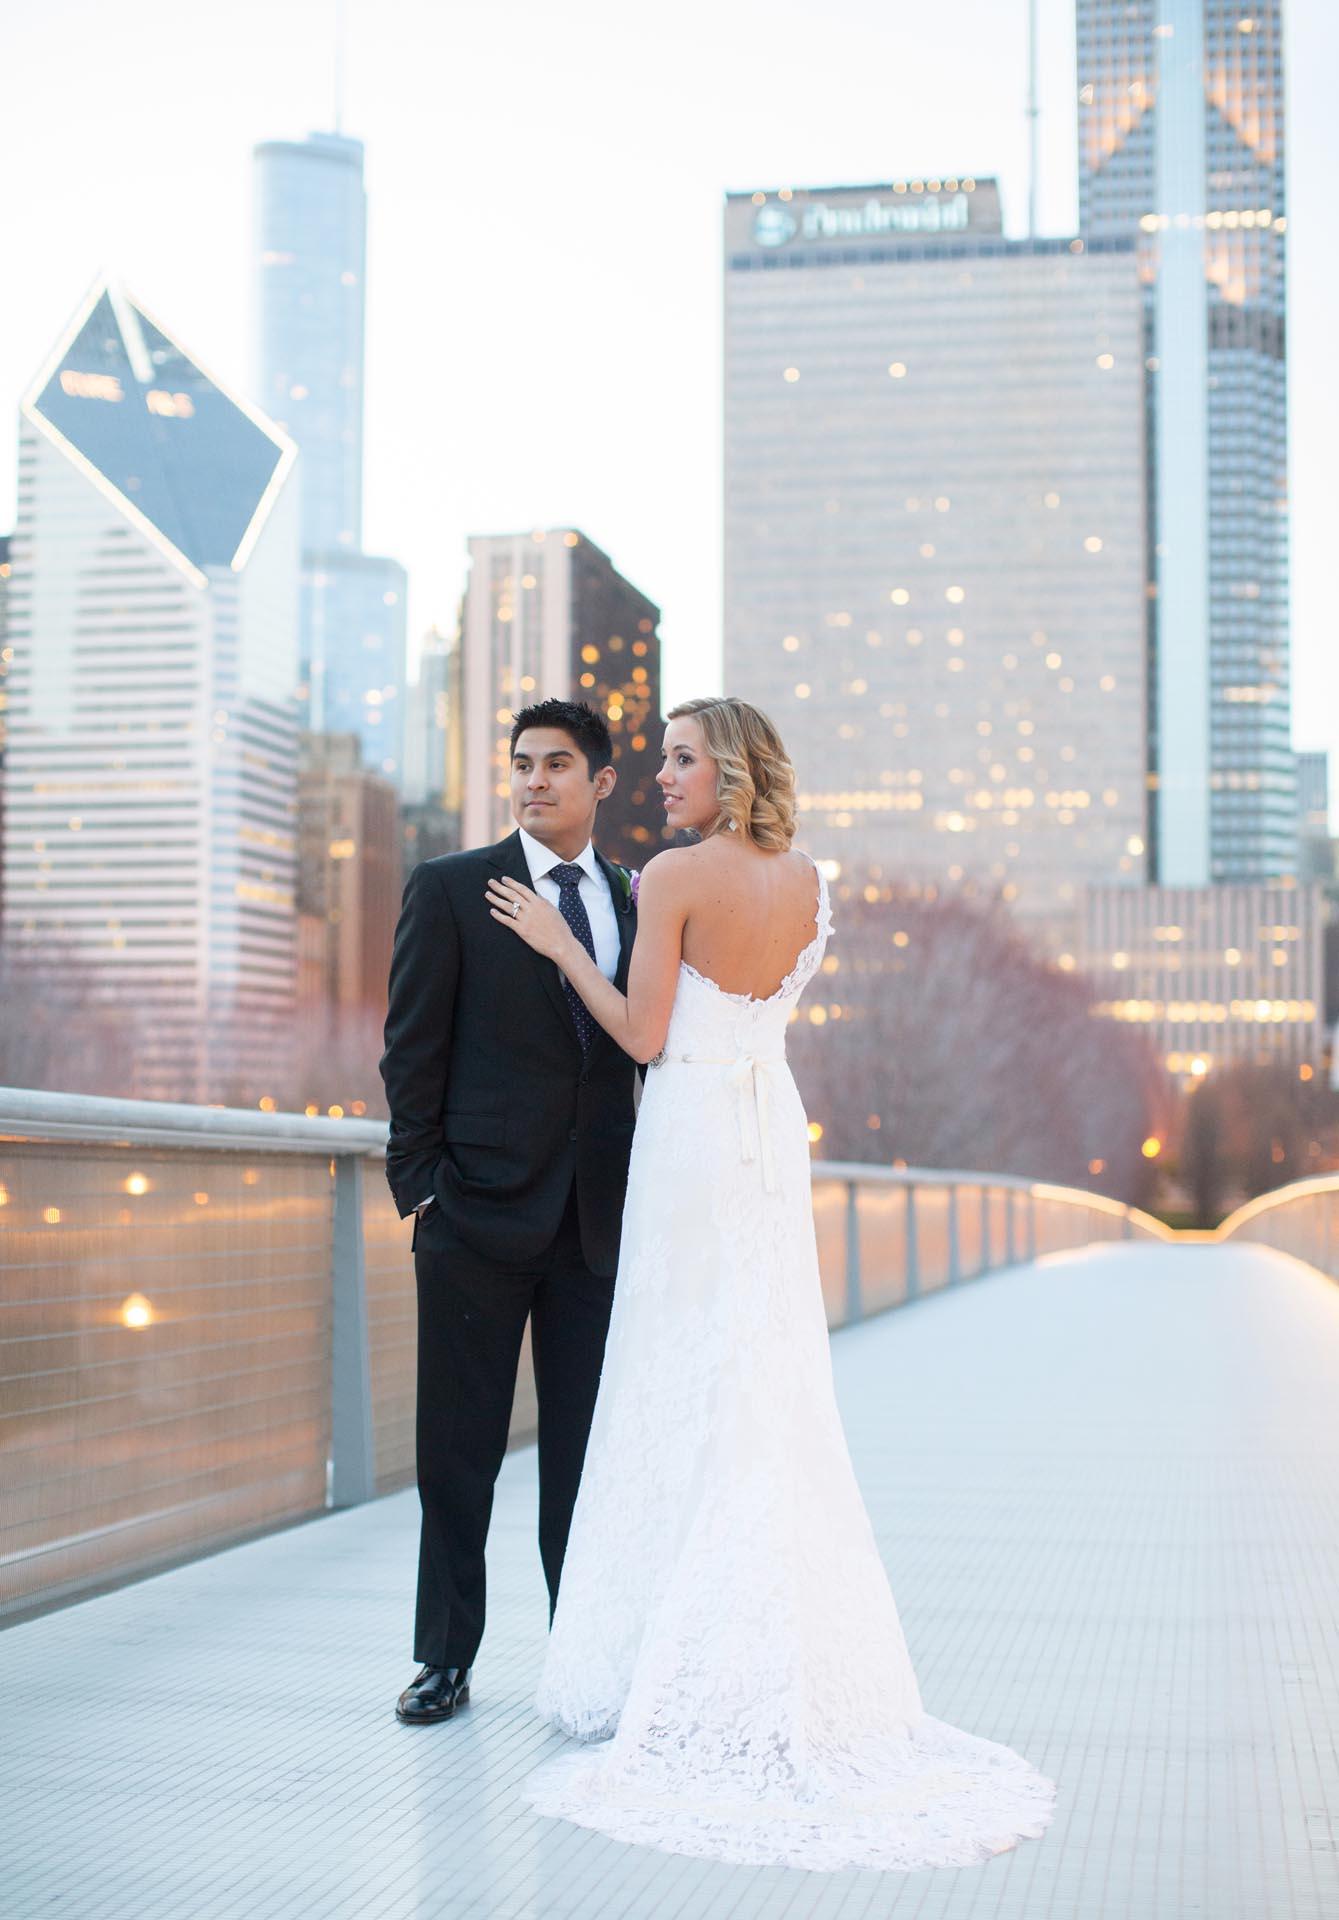 Best Chicago Wedding Photography